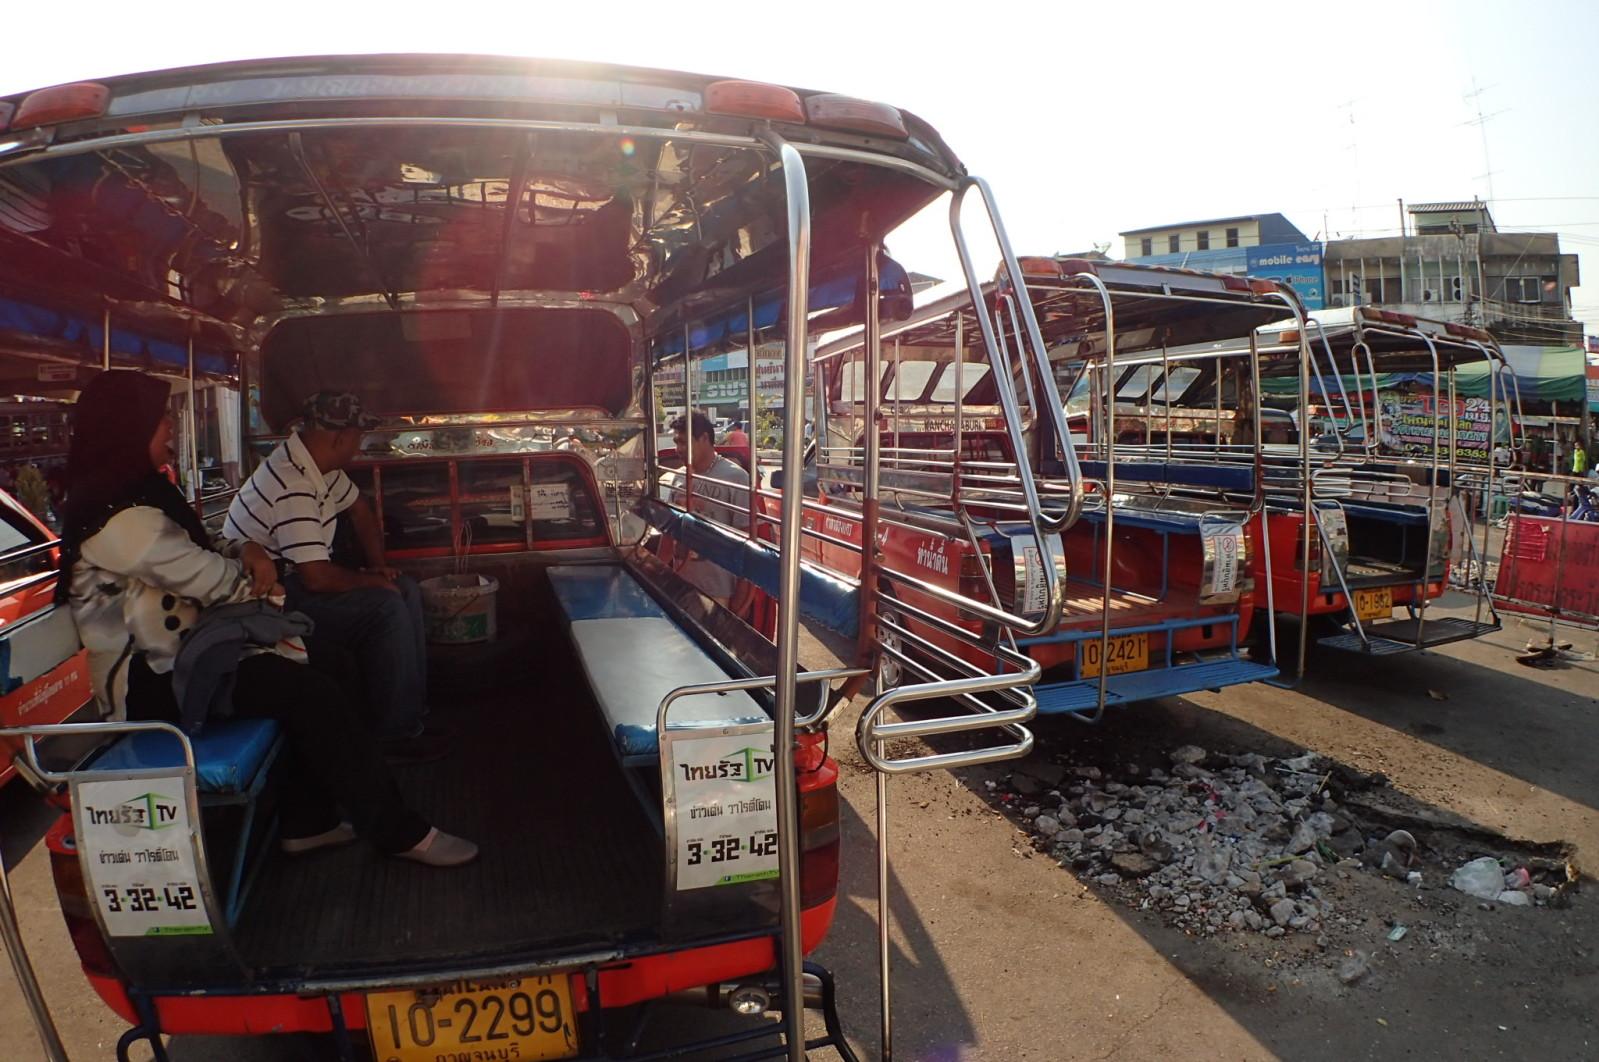 Ada banyak jeepney kat sini. Turun je dari van terus kena serbu.